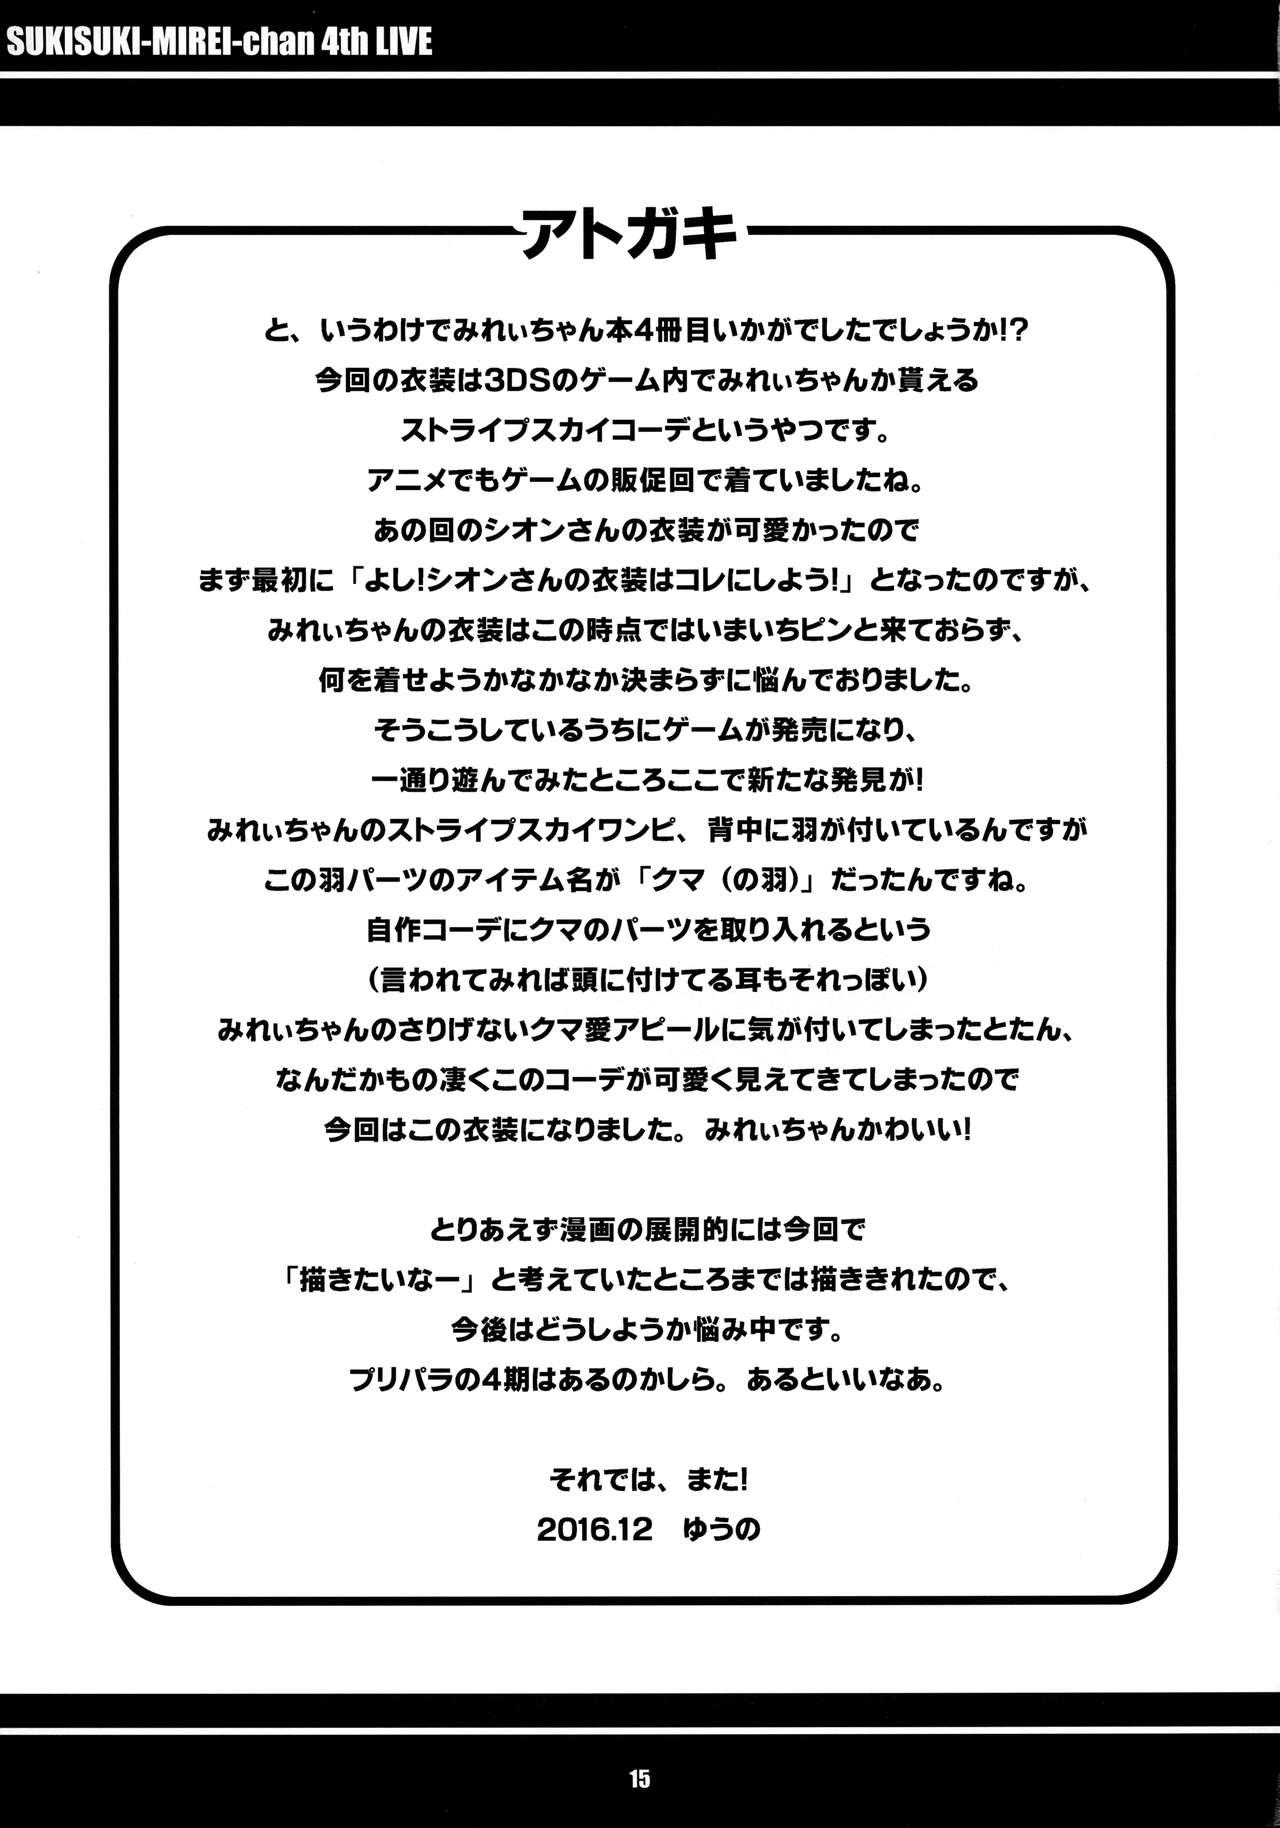 Suki Suki Mirei-chan 4th LIVE 15